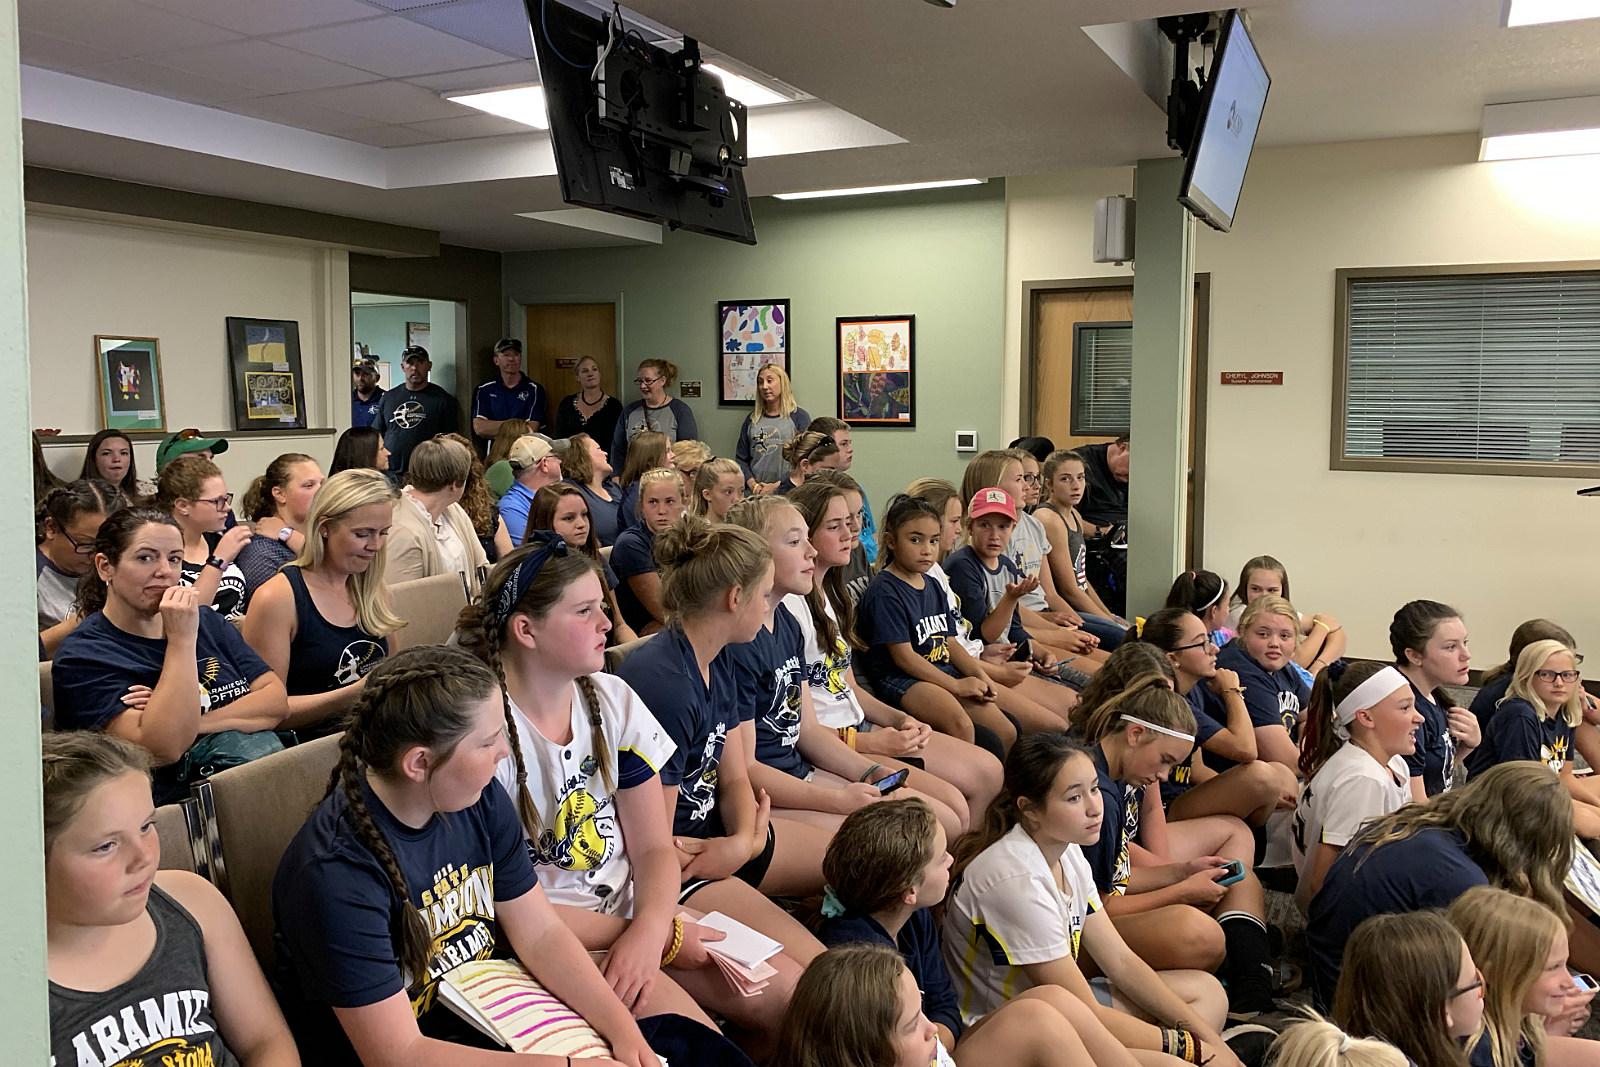 LGS, Softball, School Board, ACSD, Vote, 2019